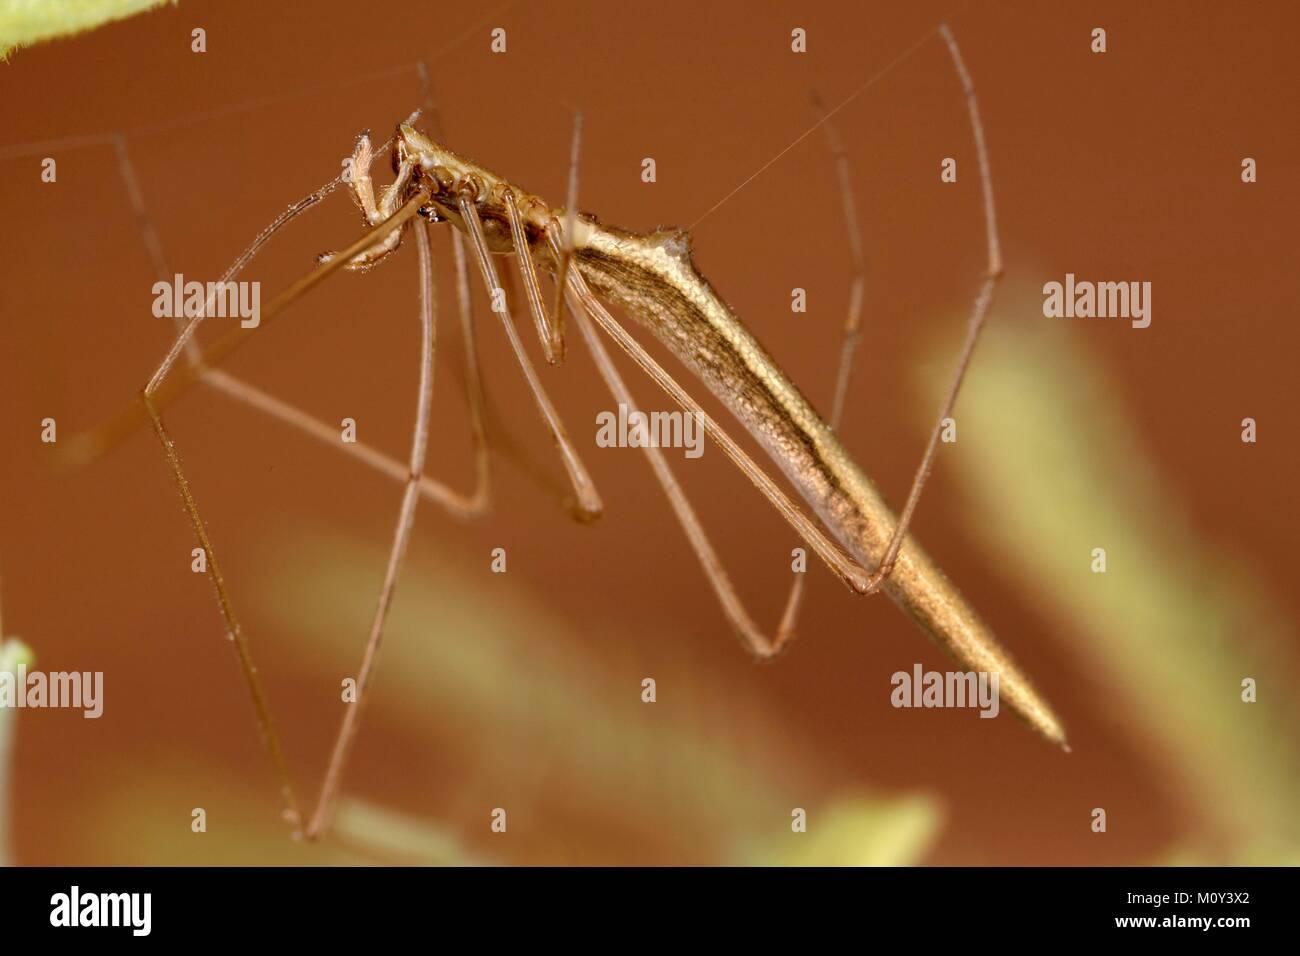 France, Pyrenees Atlantiques, Theridiidae, Cobweb Spider (Rhomphaea rostrata) - Stock Image